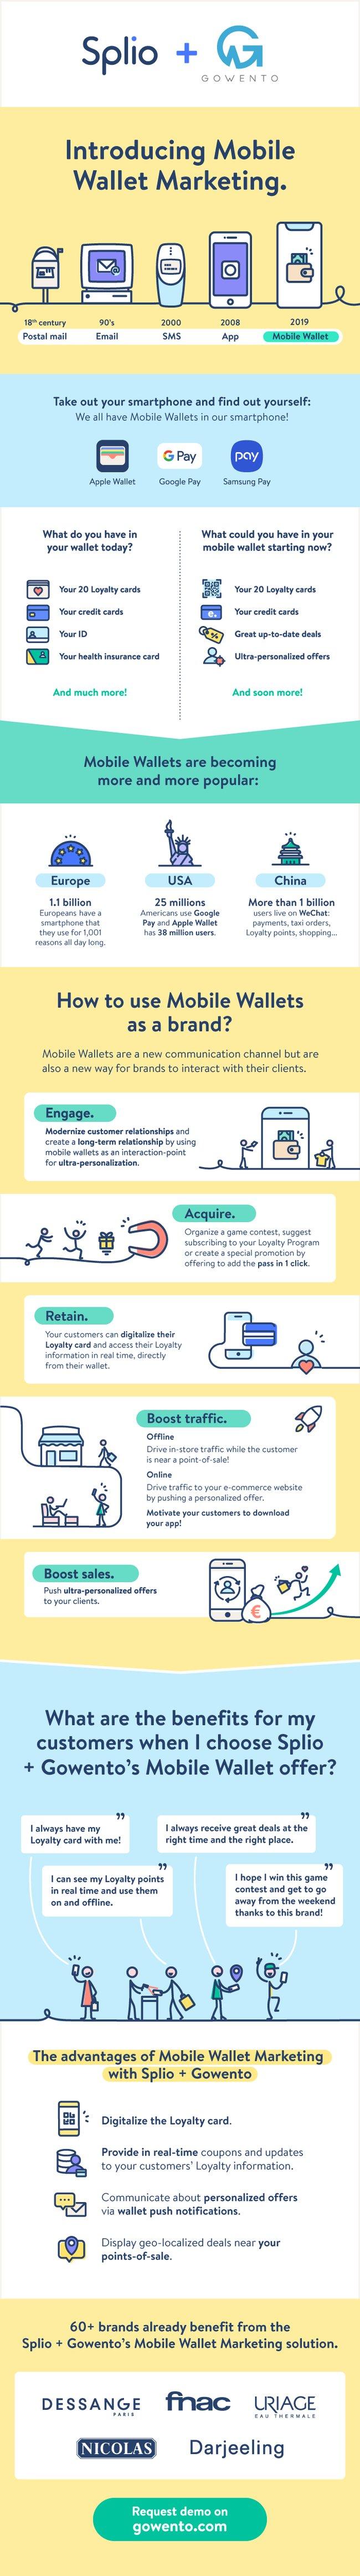 EN_infographic_mobile_wallets_2